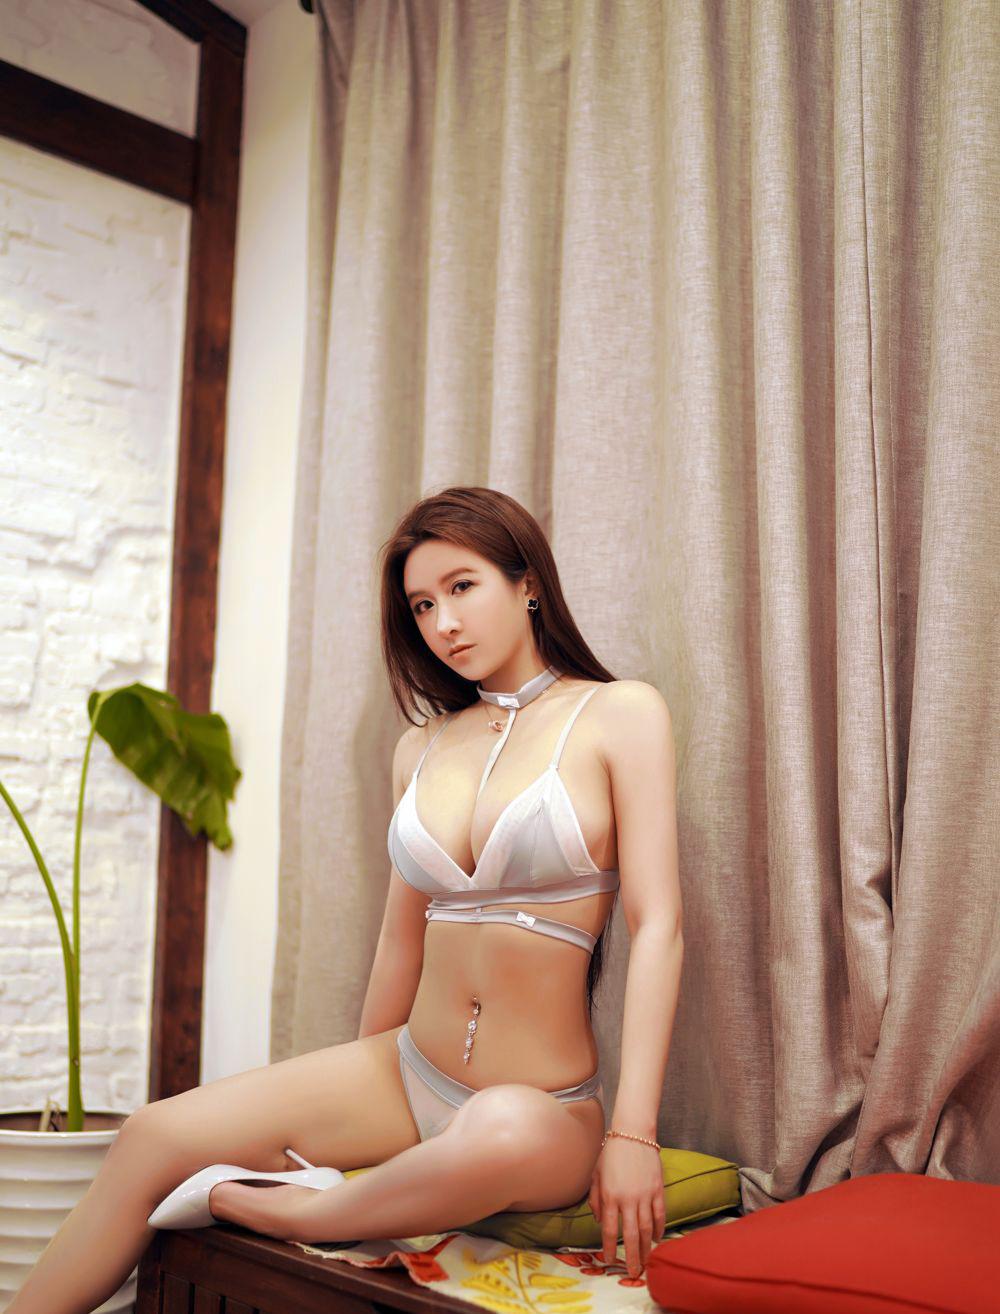 【ROSI】ROSI写真美女下体阴部似鲍鱼人体艺术大胆图片【23P】 性感内衣